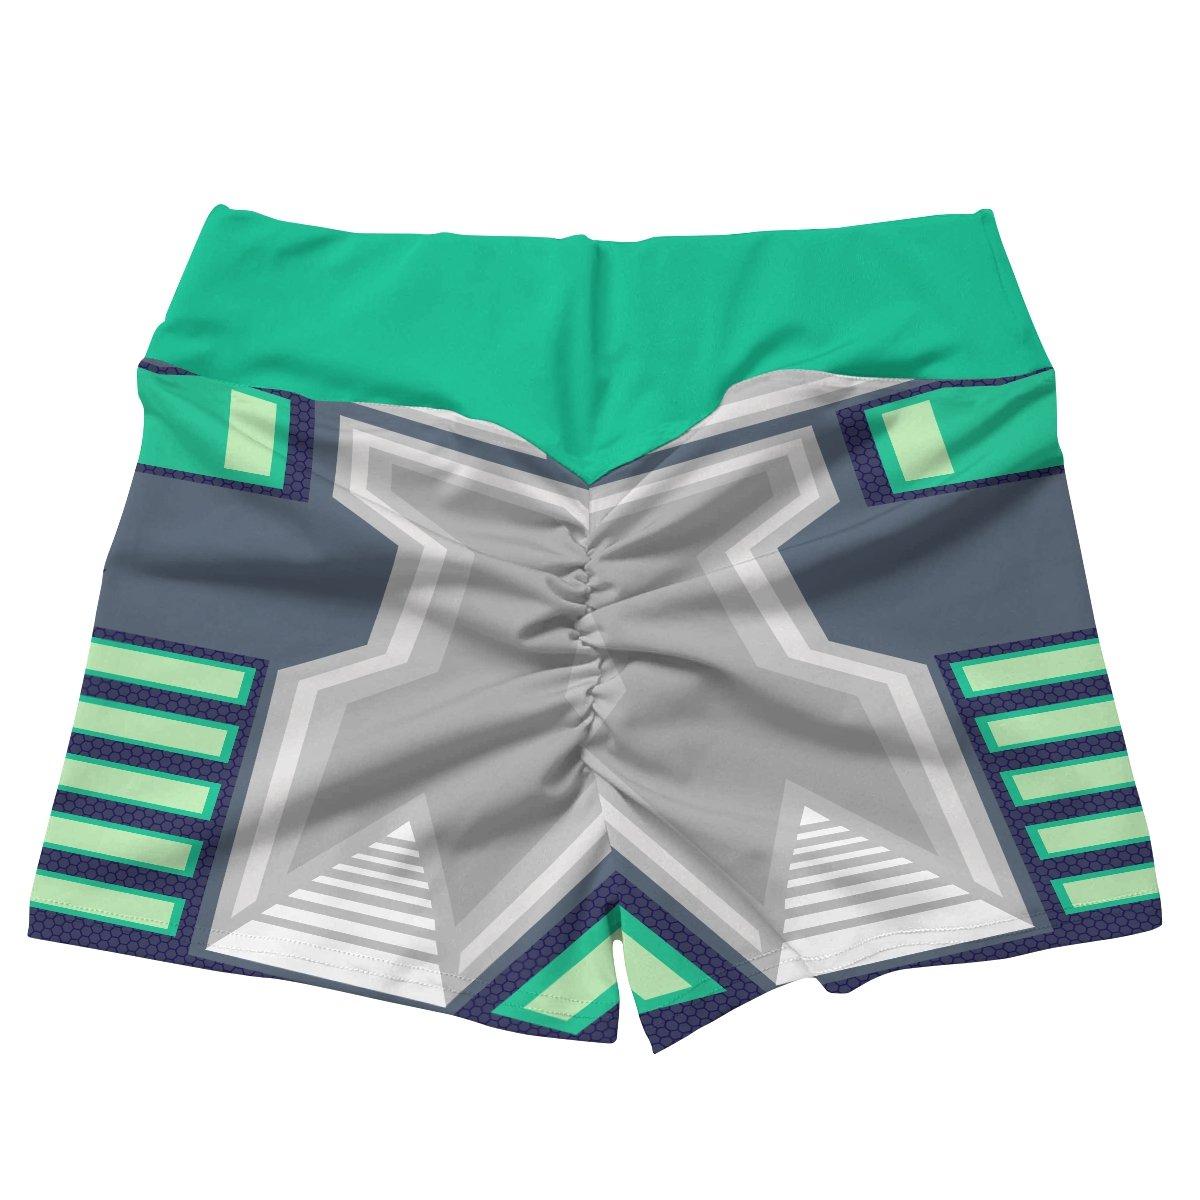 pokemon steel uniform active wear set 543275 - Anime Swimsuits